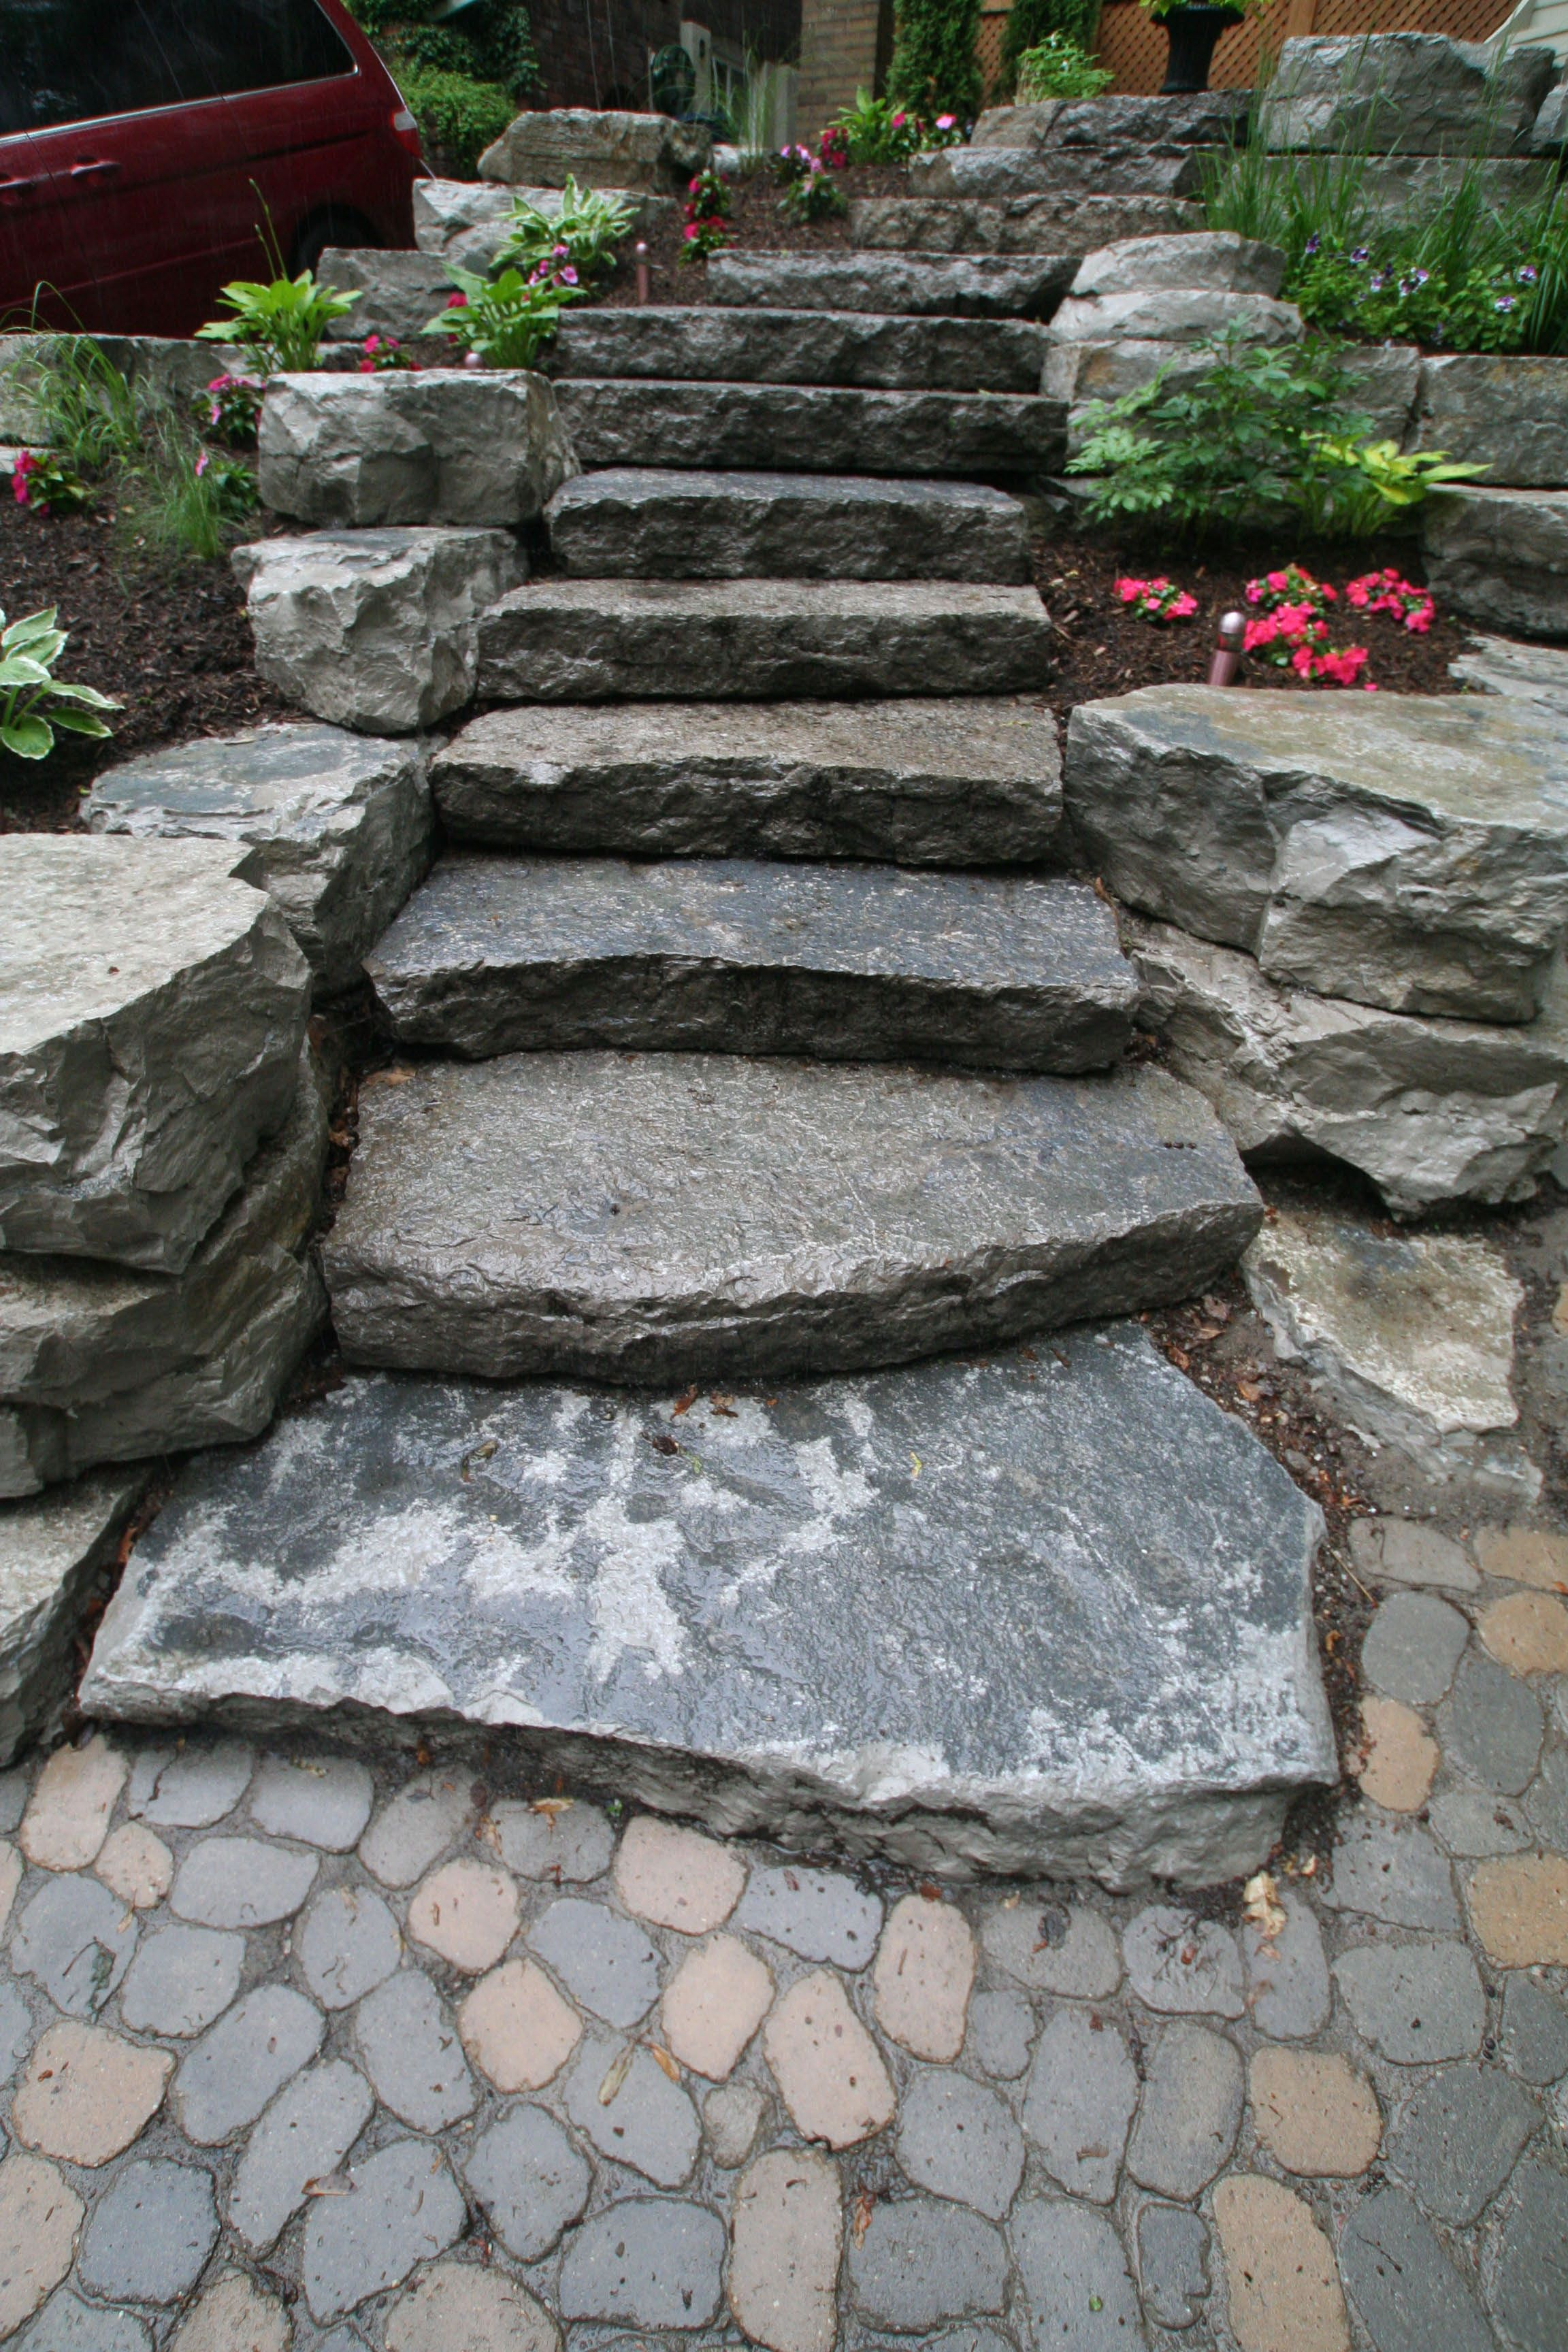 orillia armour stone front yard